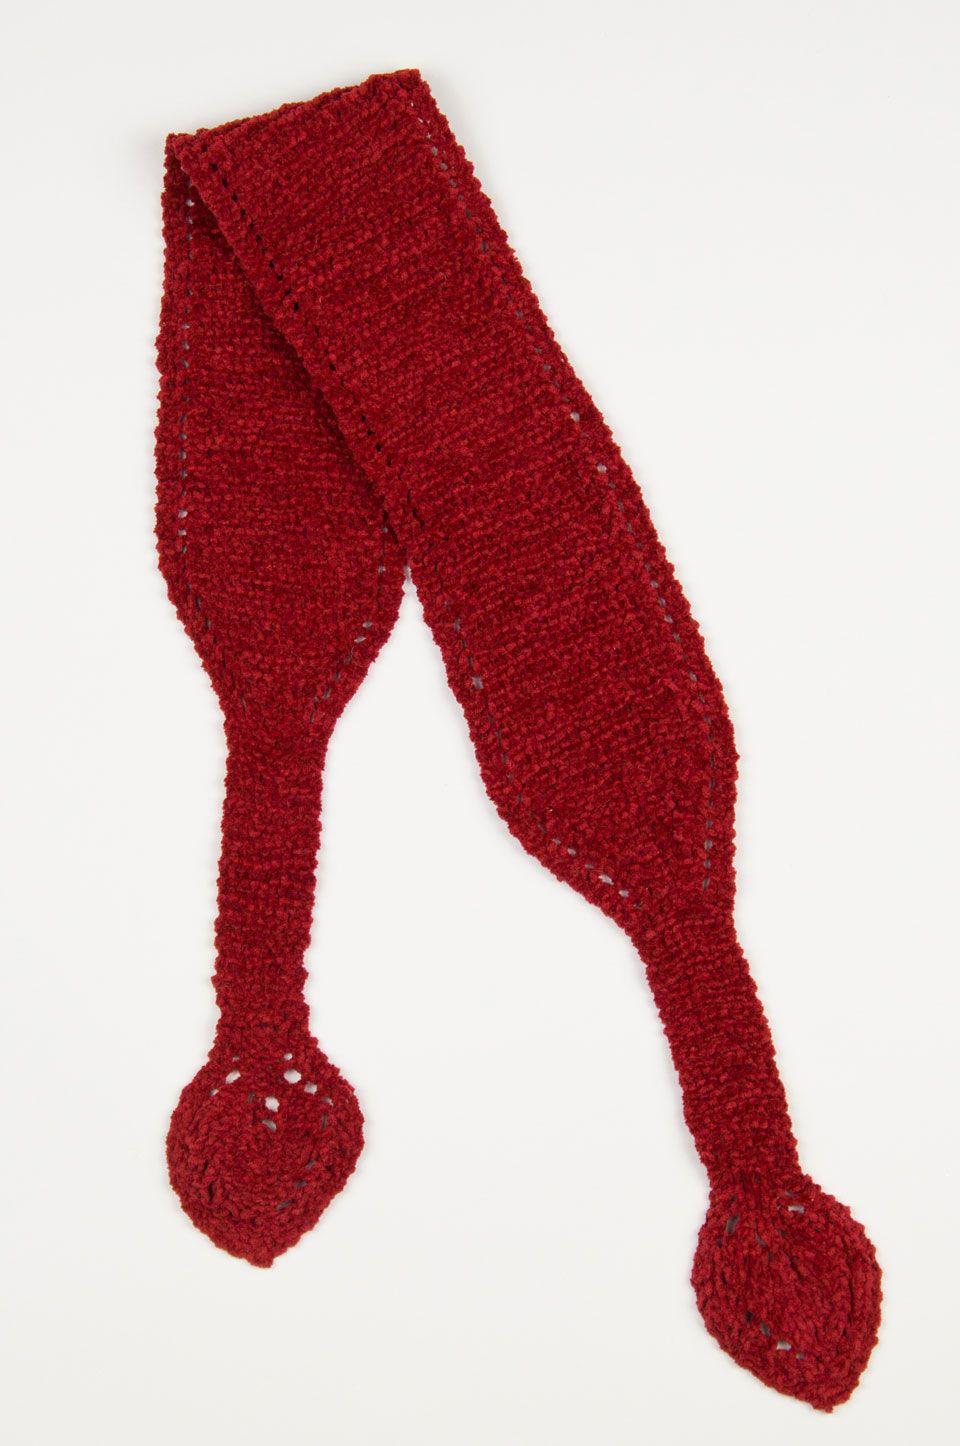 ROWAN\' Headscarf Knitting Kit / Irish Yarn Wool and Headscarf ...